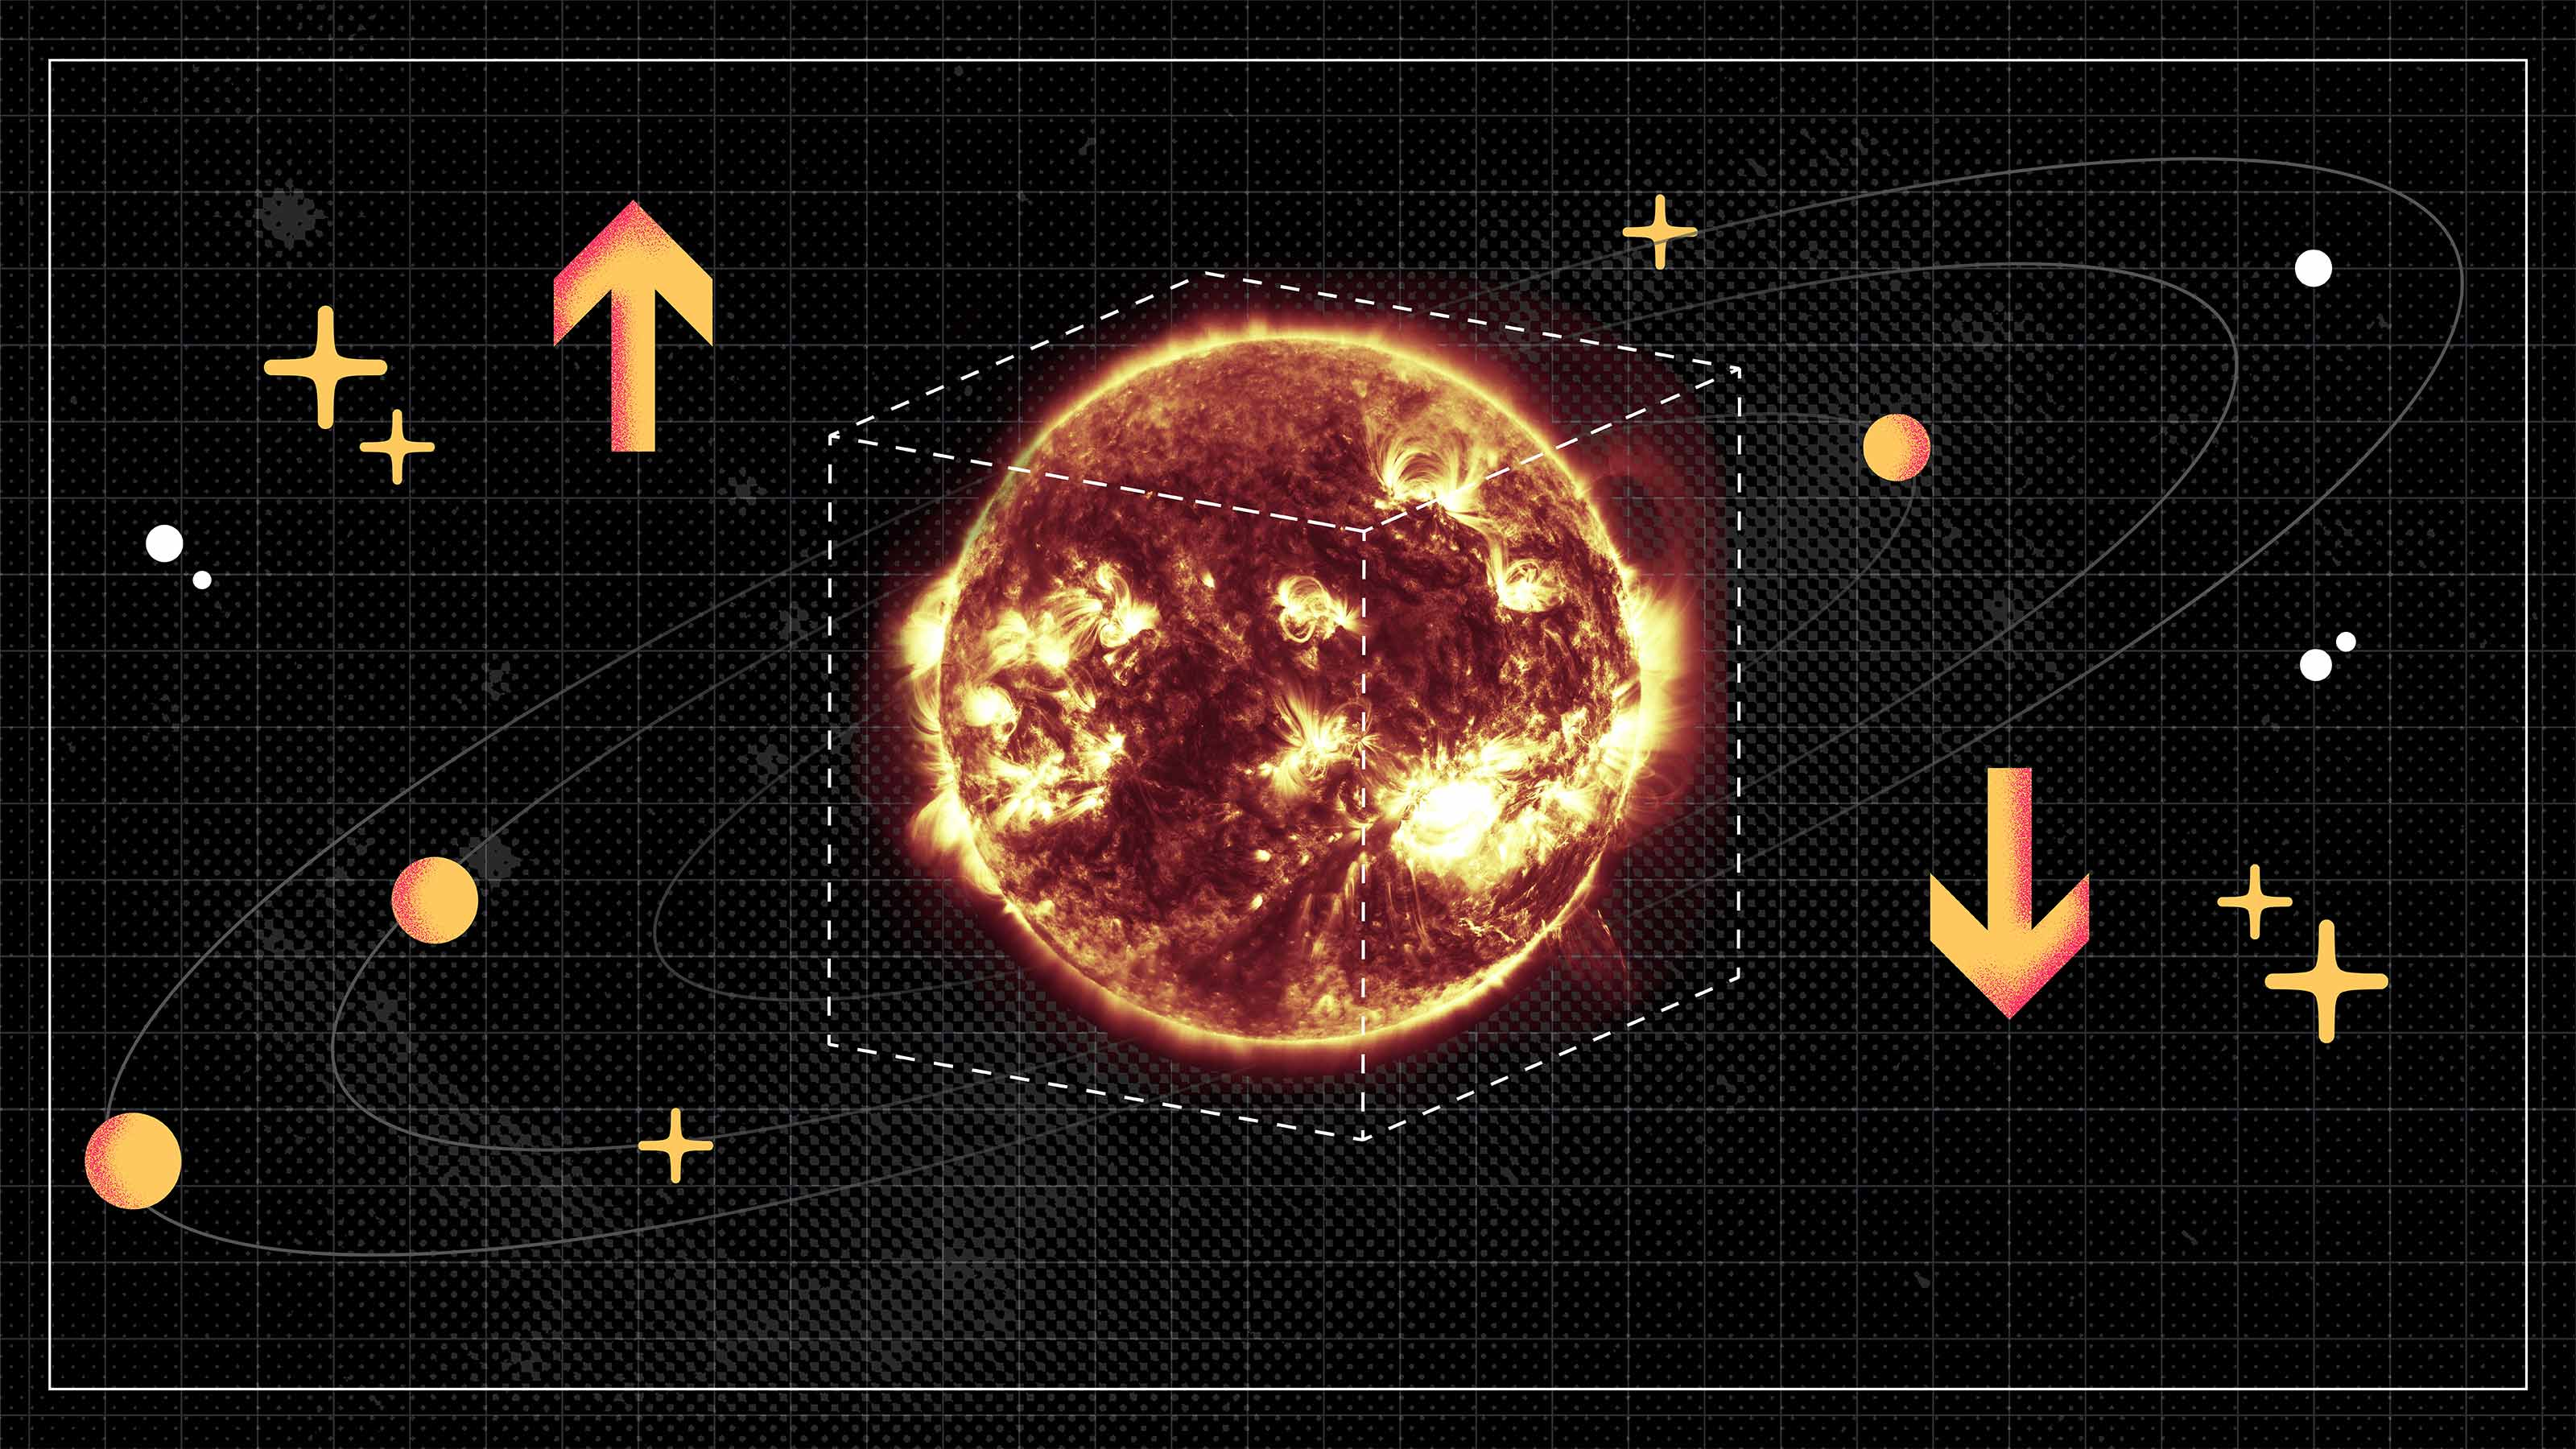 StellarEngineChatbotPic